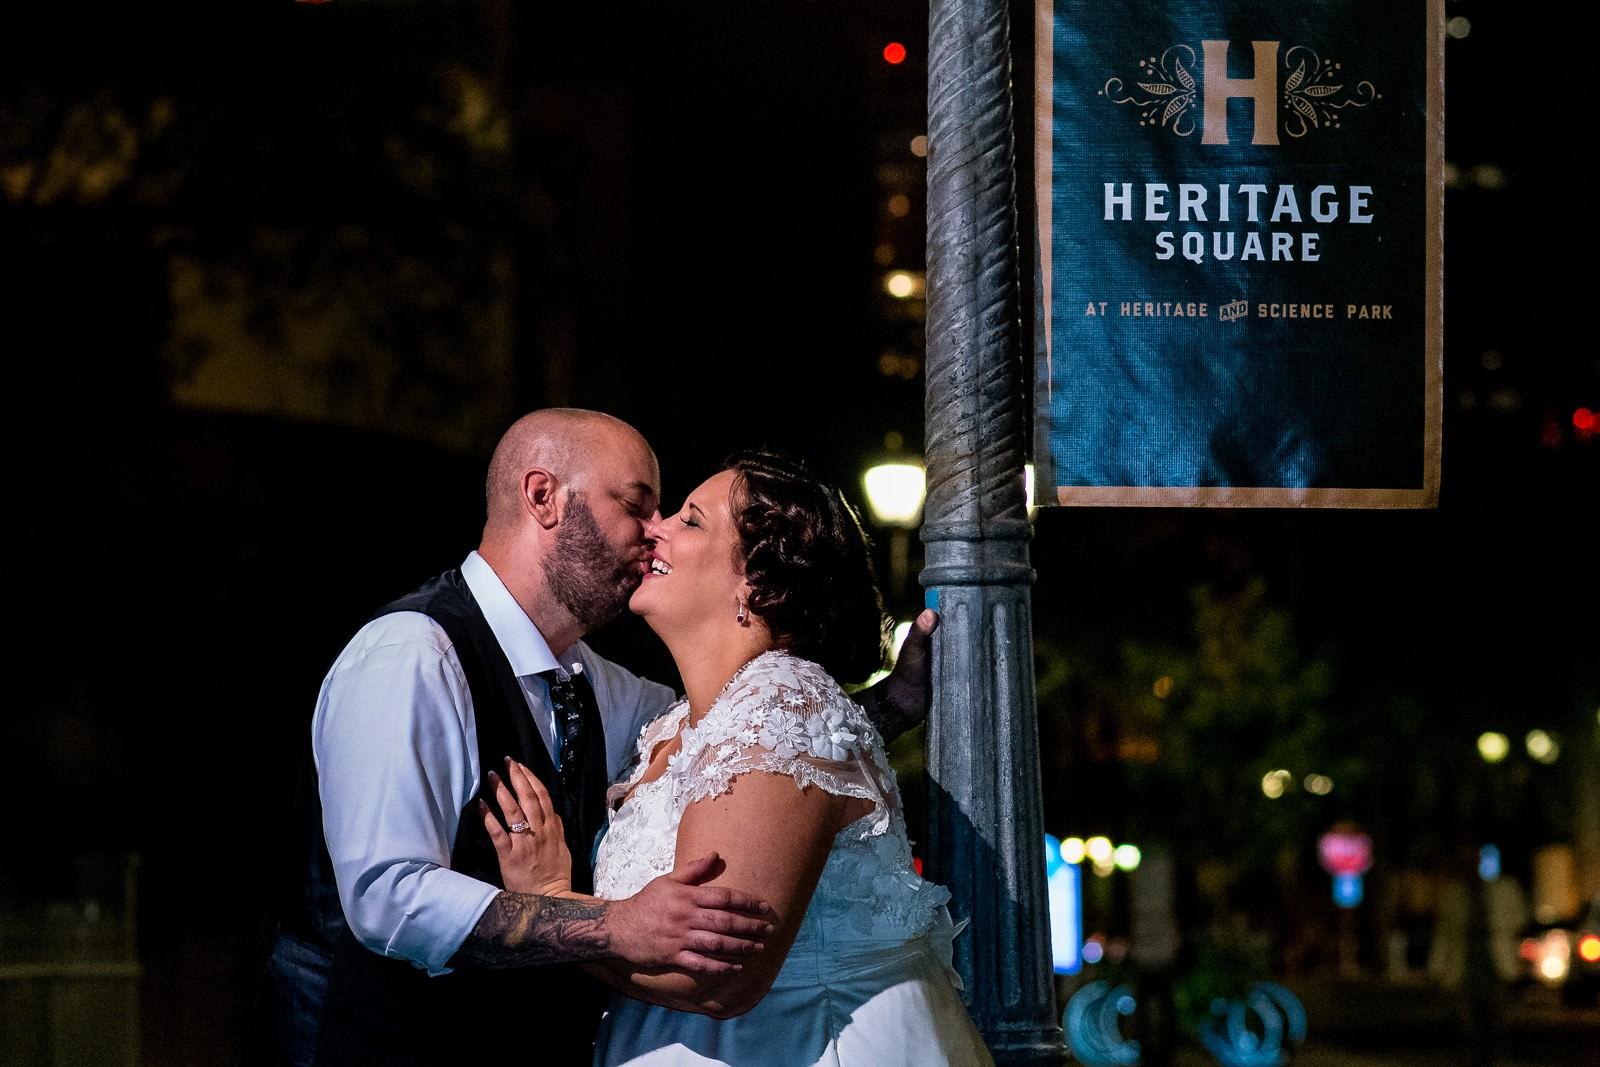 phoenix-heritage-square-wedding-phoenix-wedding-photographers-66